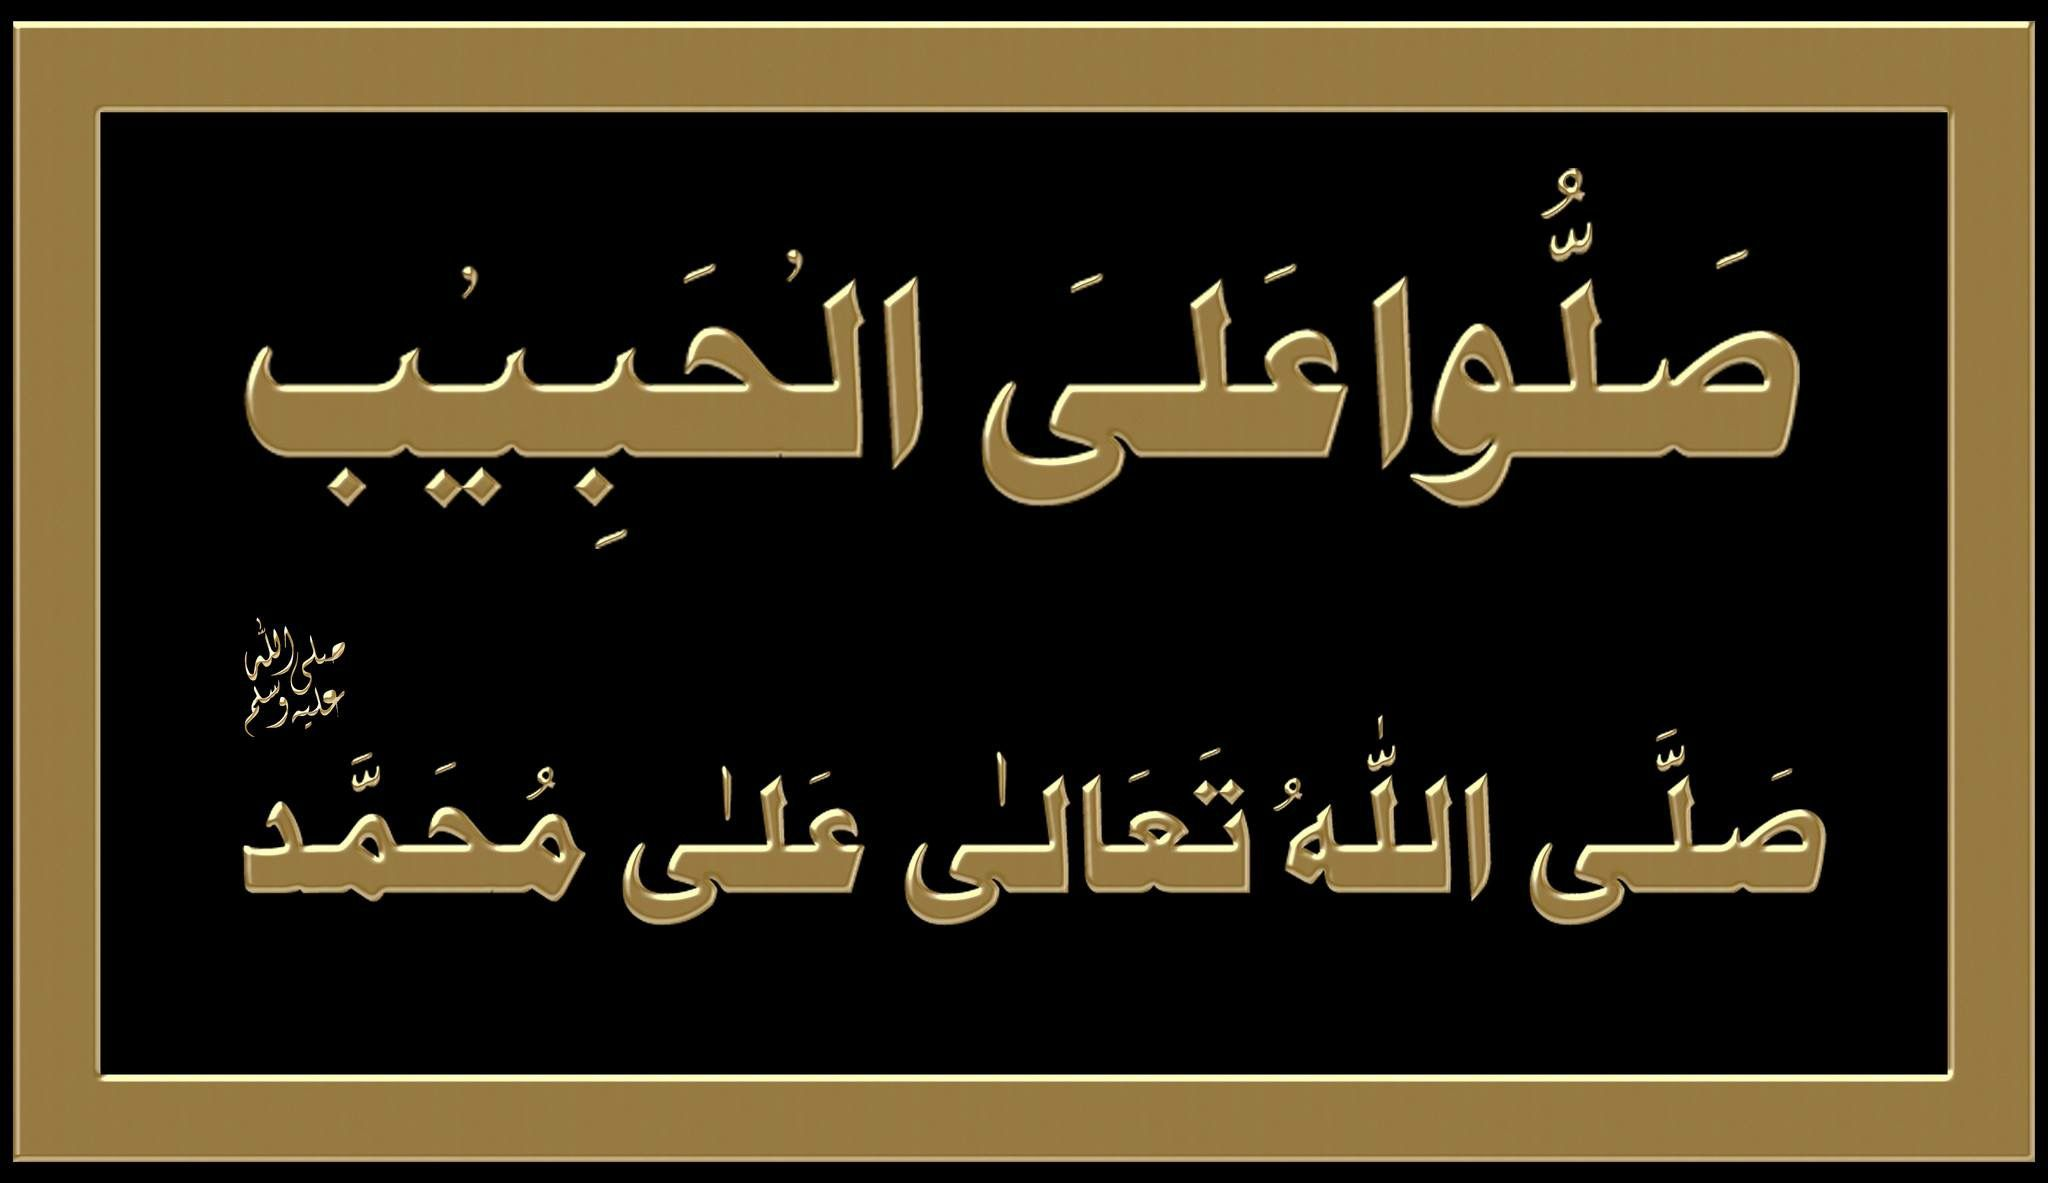 Pin oleh Yuli yl di Salam Islami 2 di 2020 Kutipan